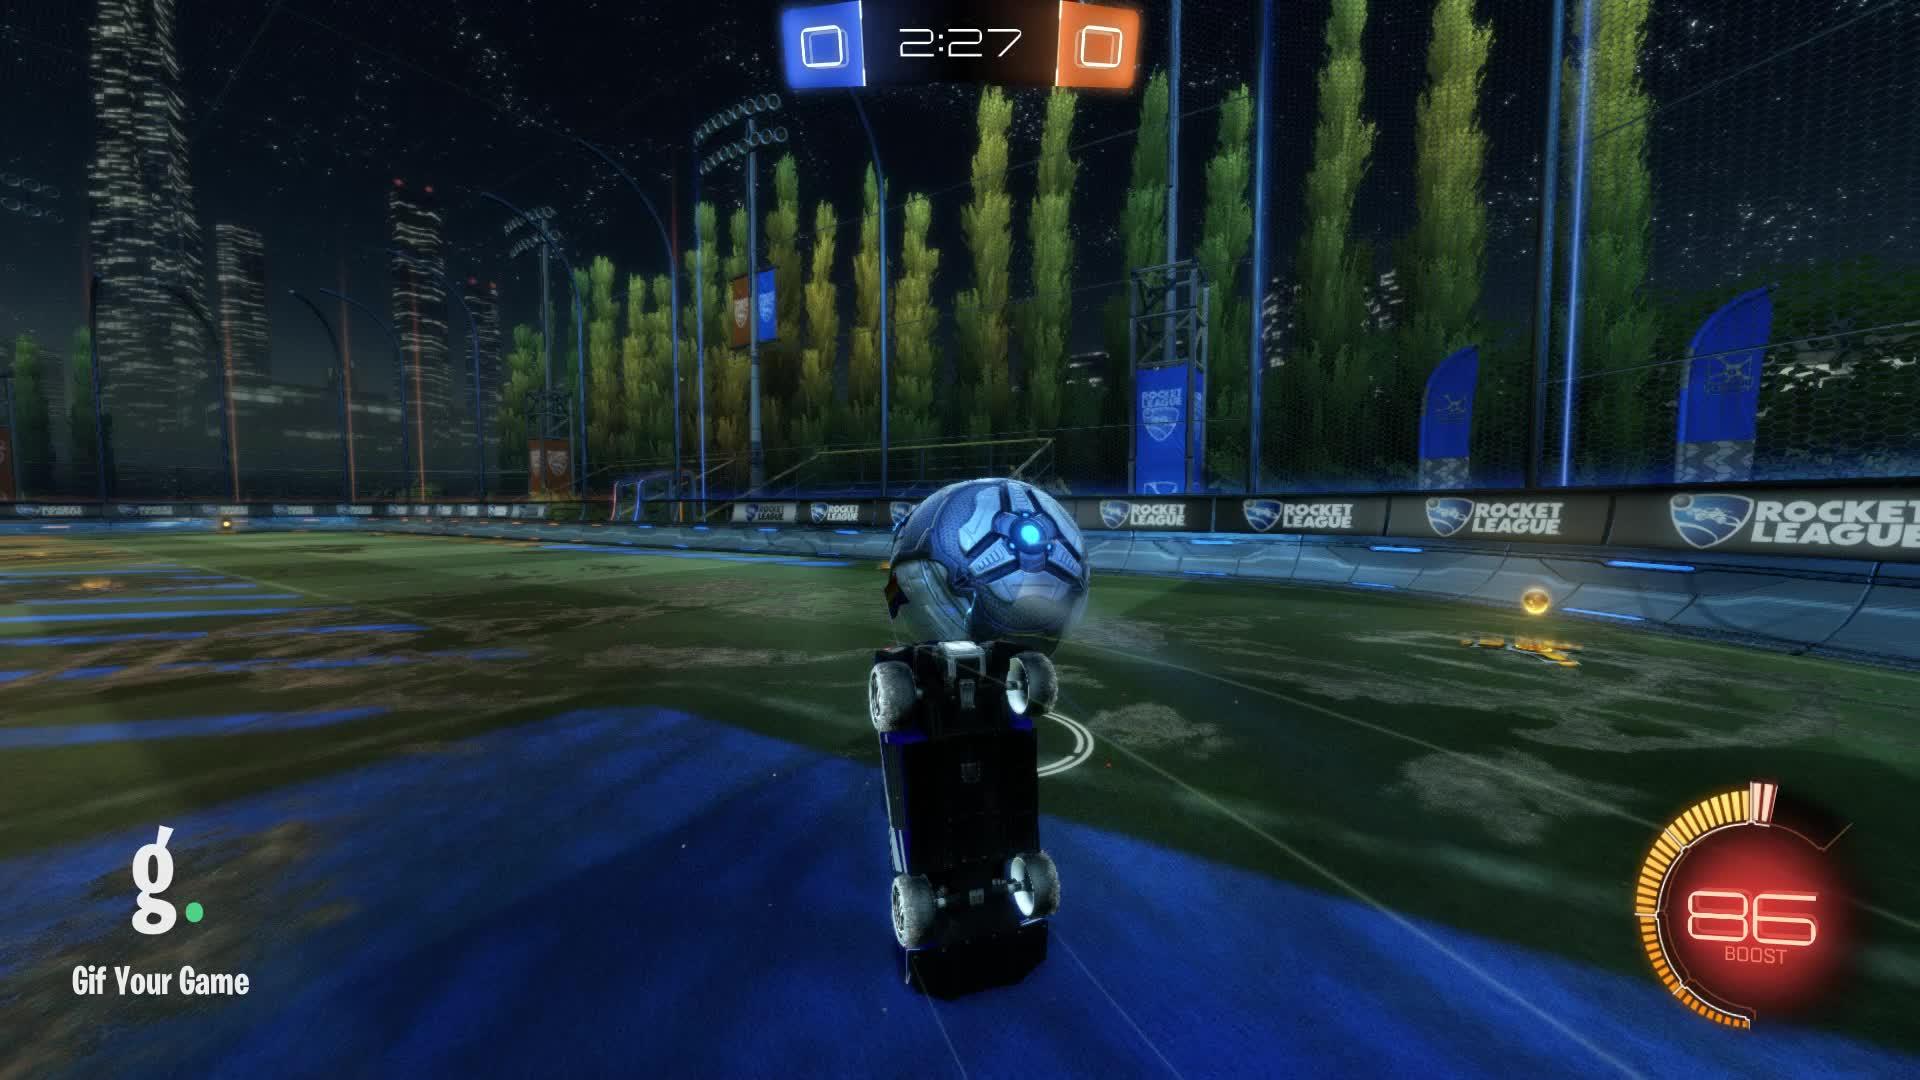 Gif Your Game, GifYourGame, I like beards :), Rocket League, RocketLeague, Goal 1: I like beards :) GIFs